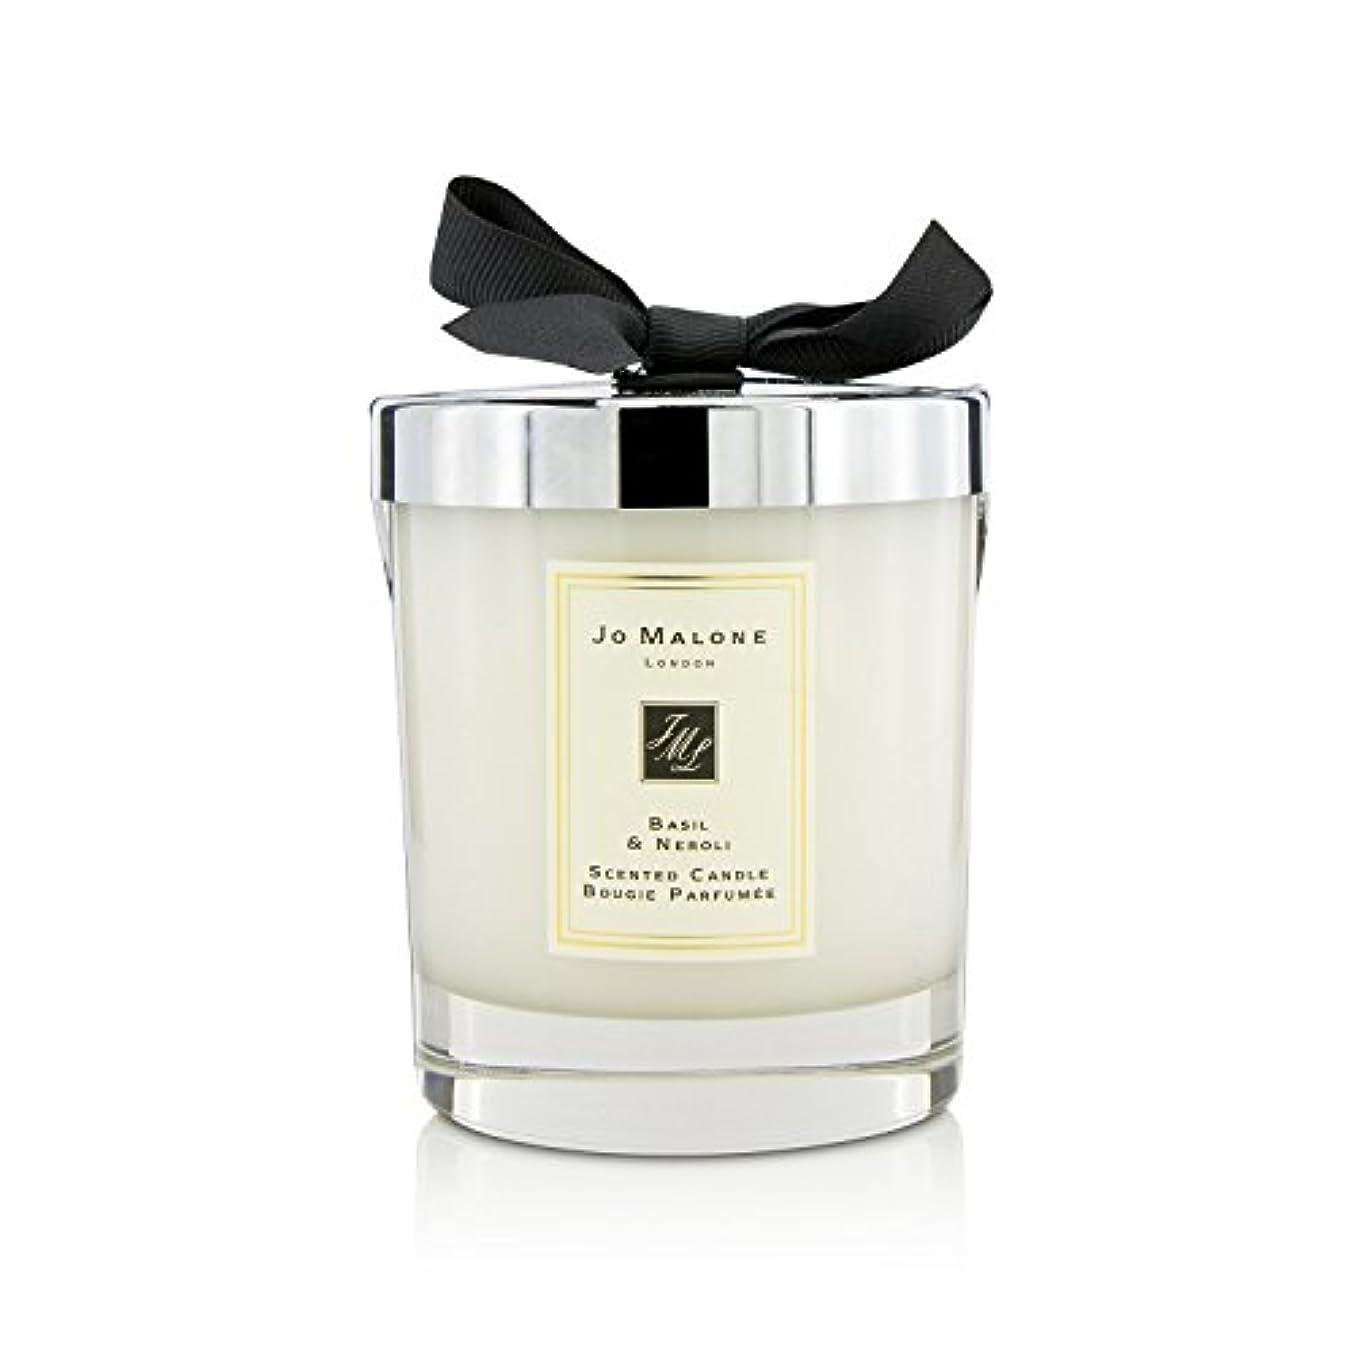 [Jo Malone(ジョーマローン)] バジル&ネロリの香りのキャンドル 200g (2.5 inch)